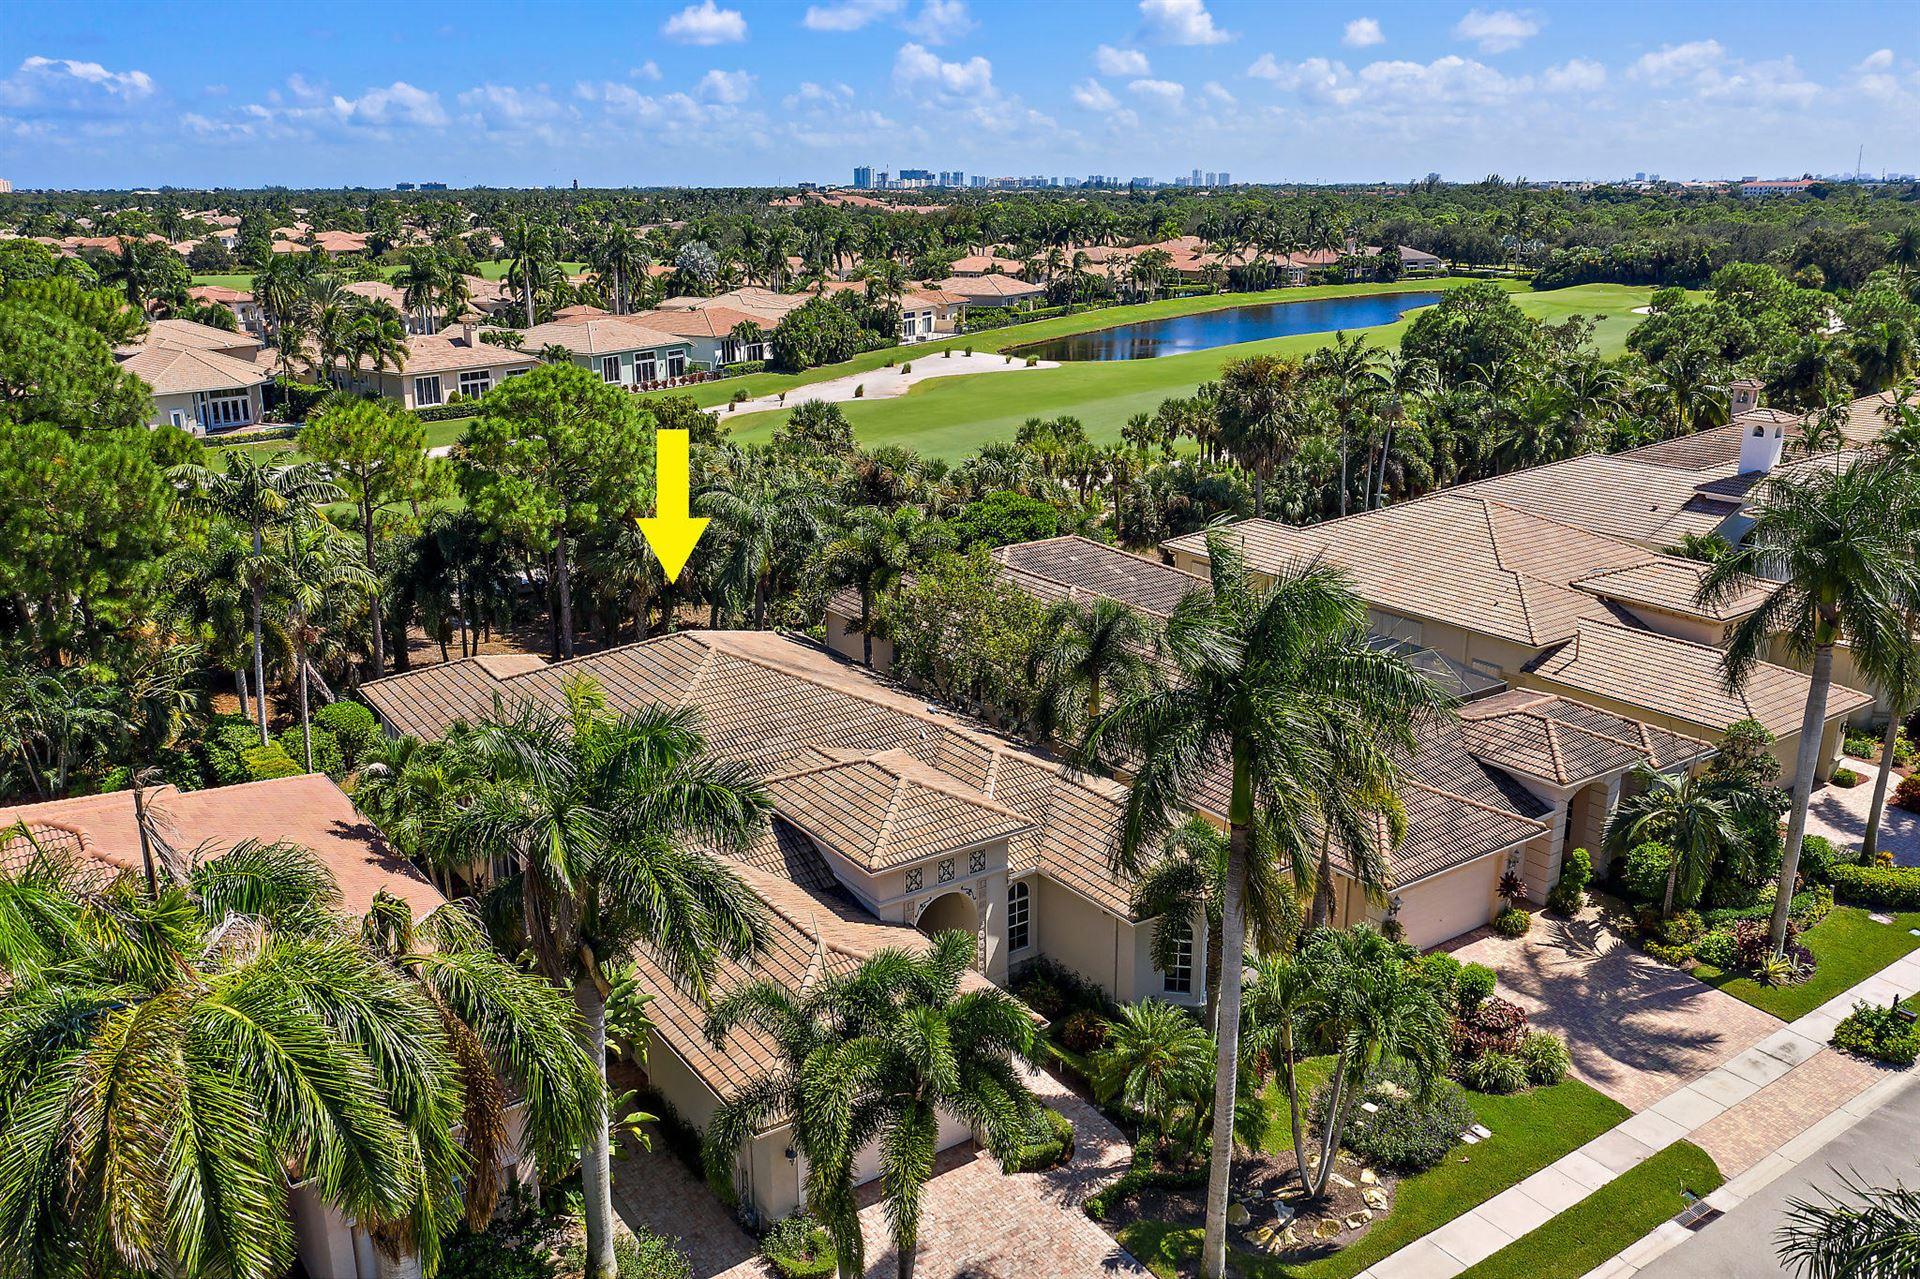 Photo of 130 Abondance Drive, Palm Beach Gardens, FL 33410 (MLS # RX-10622085)